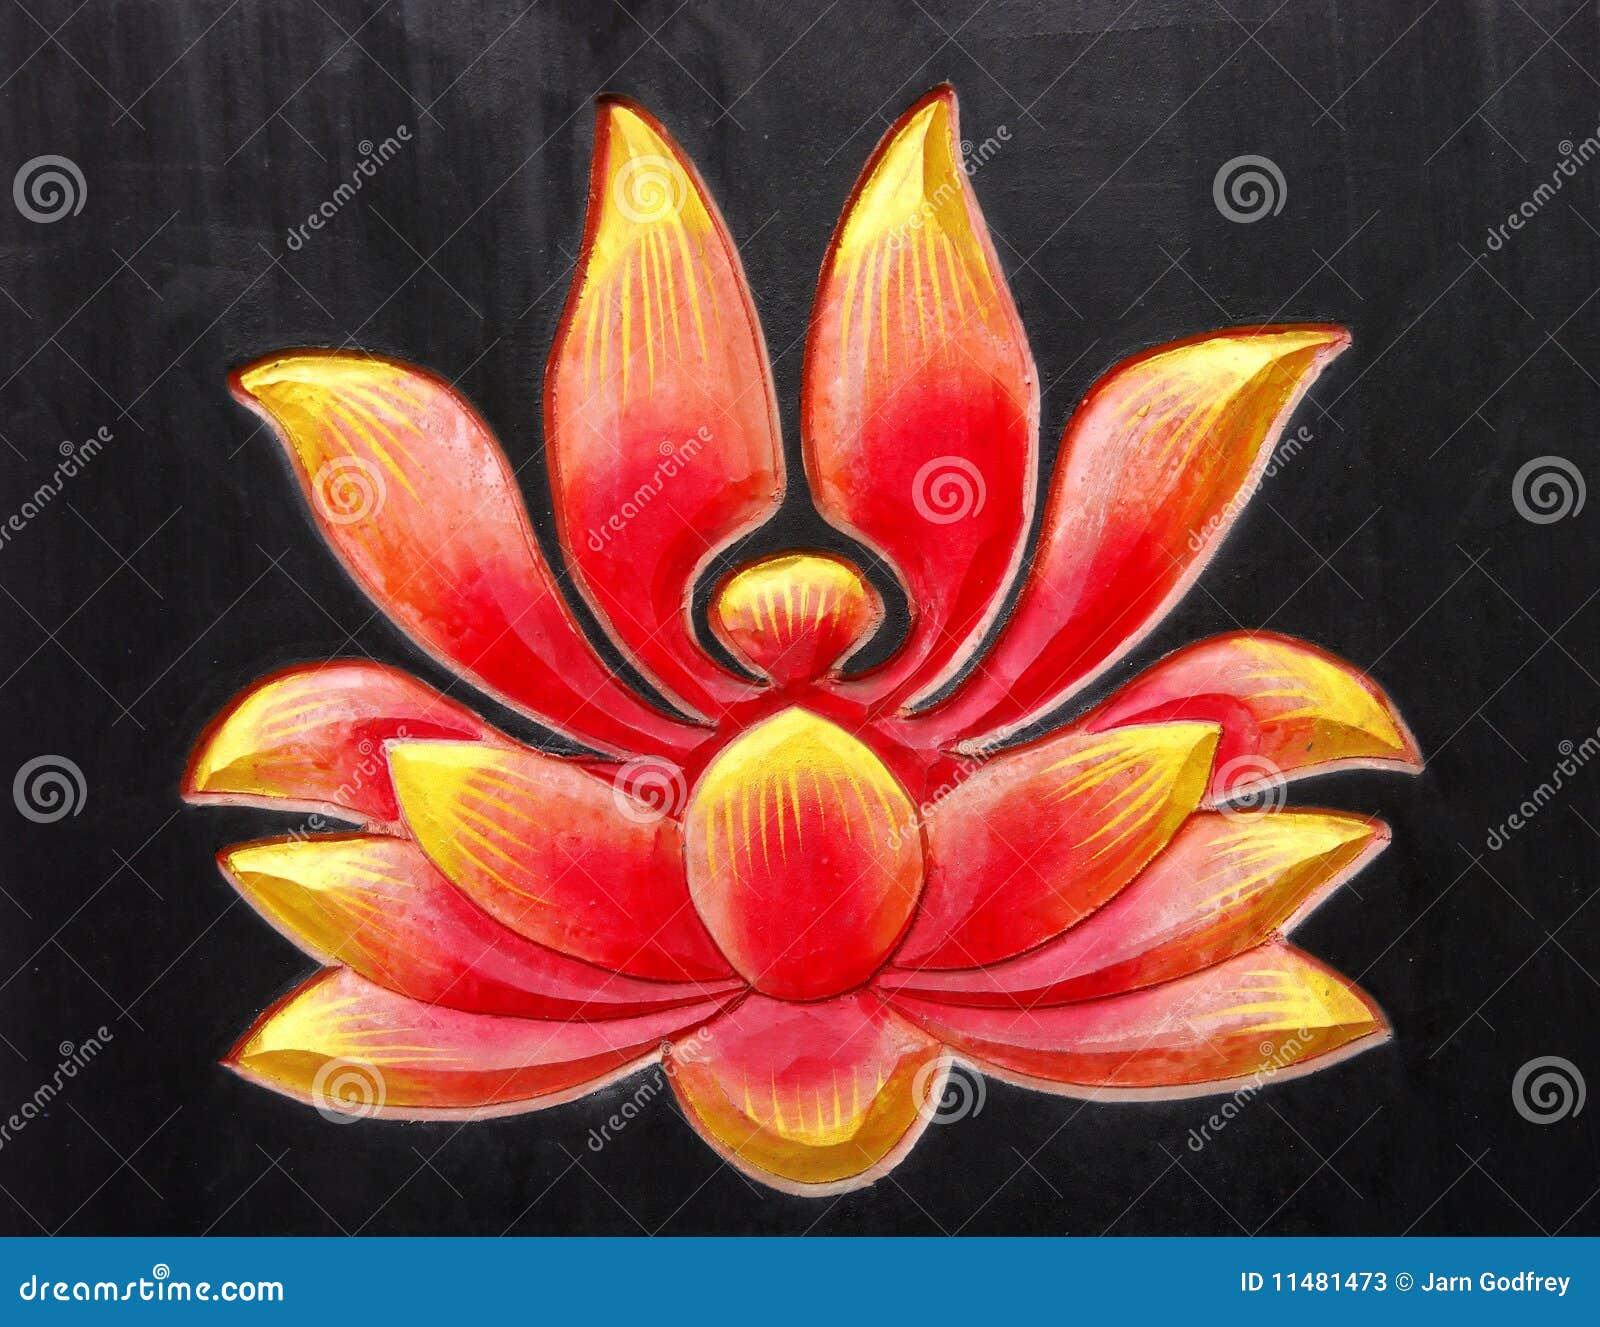 Buddhist Lotus Design Stock Photos Image 11481473